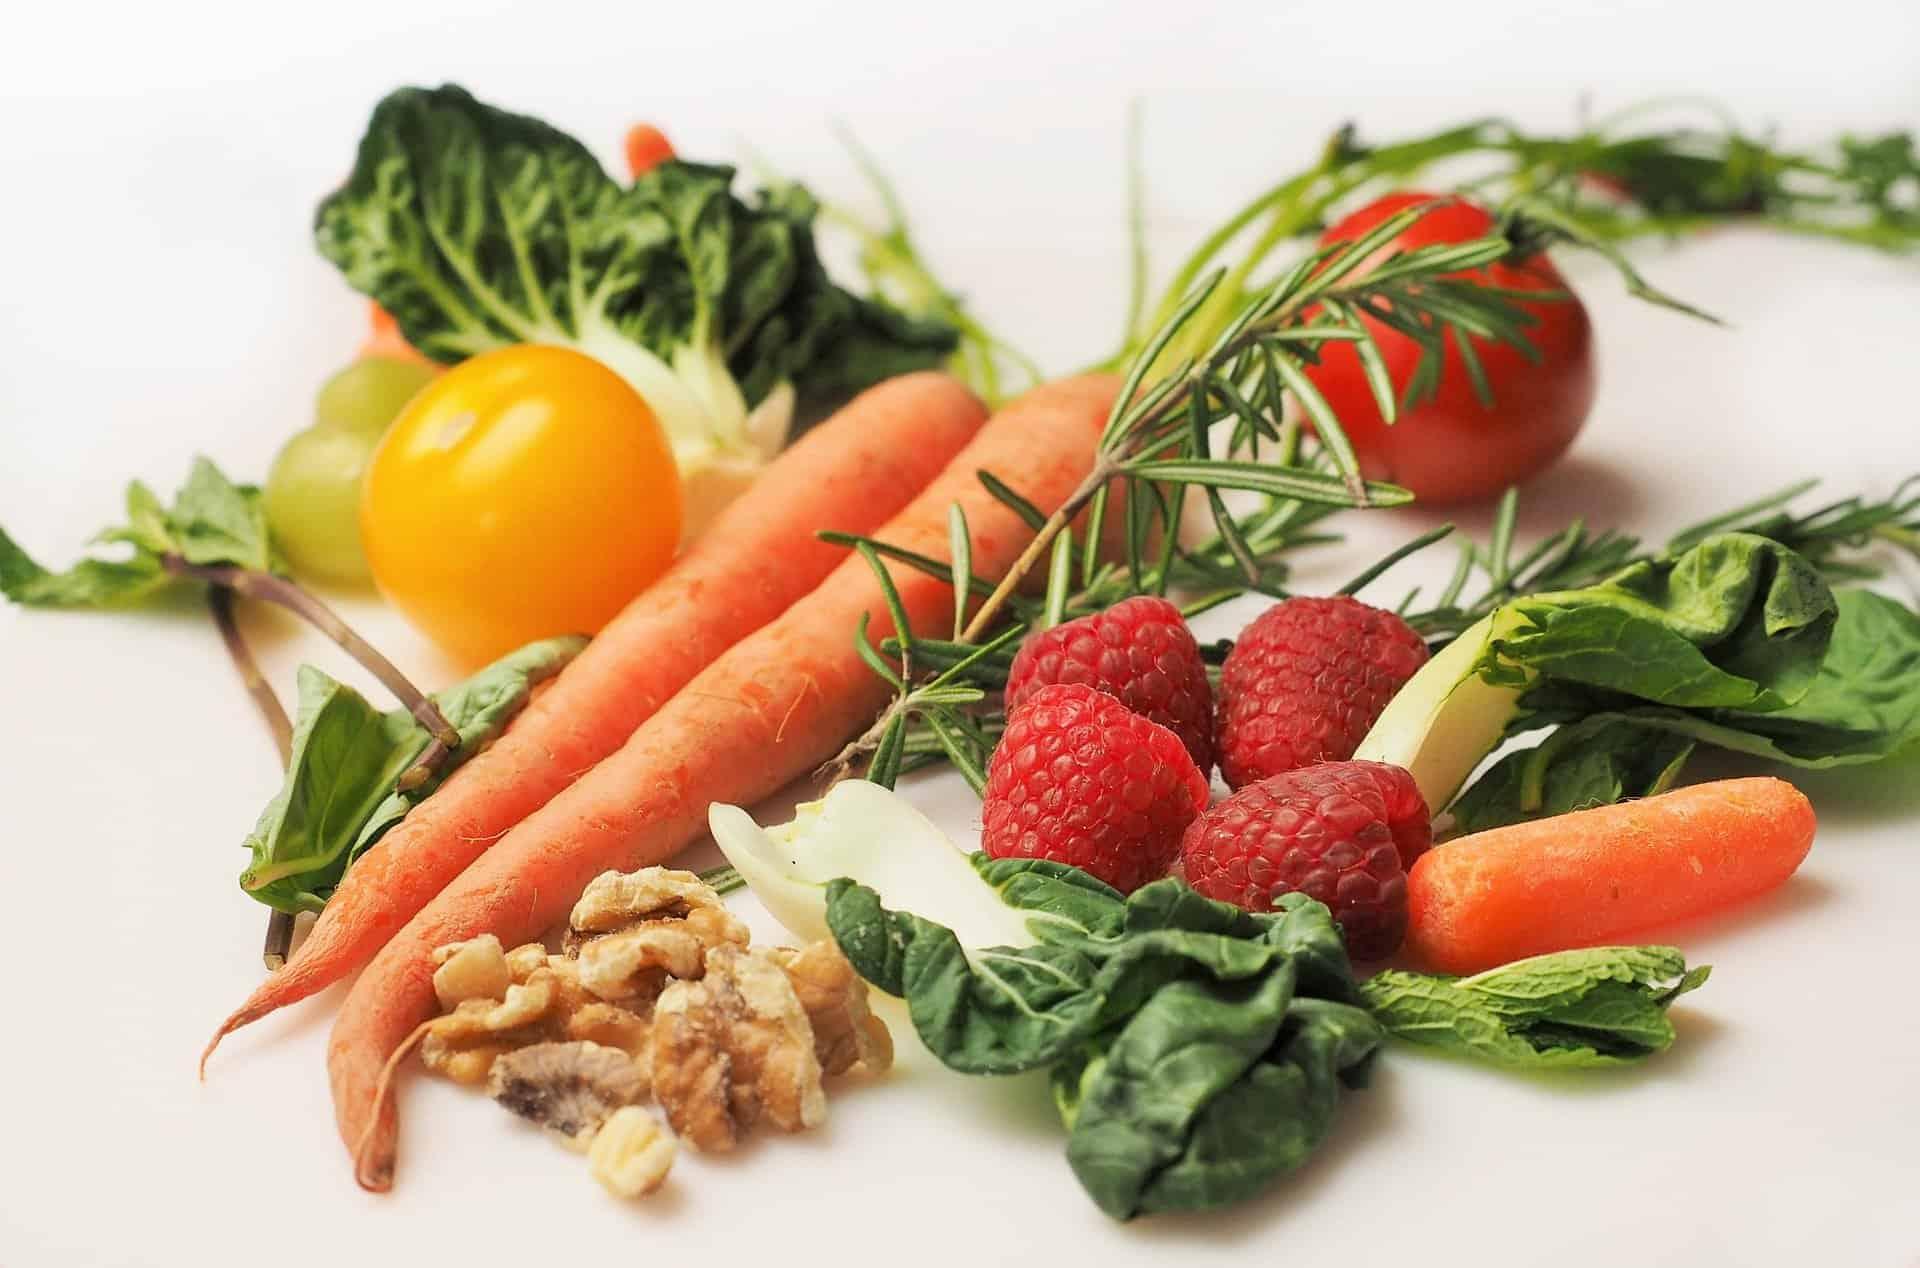 Assortment of vegetables